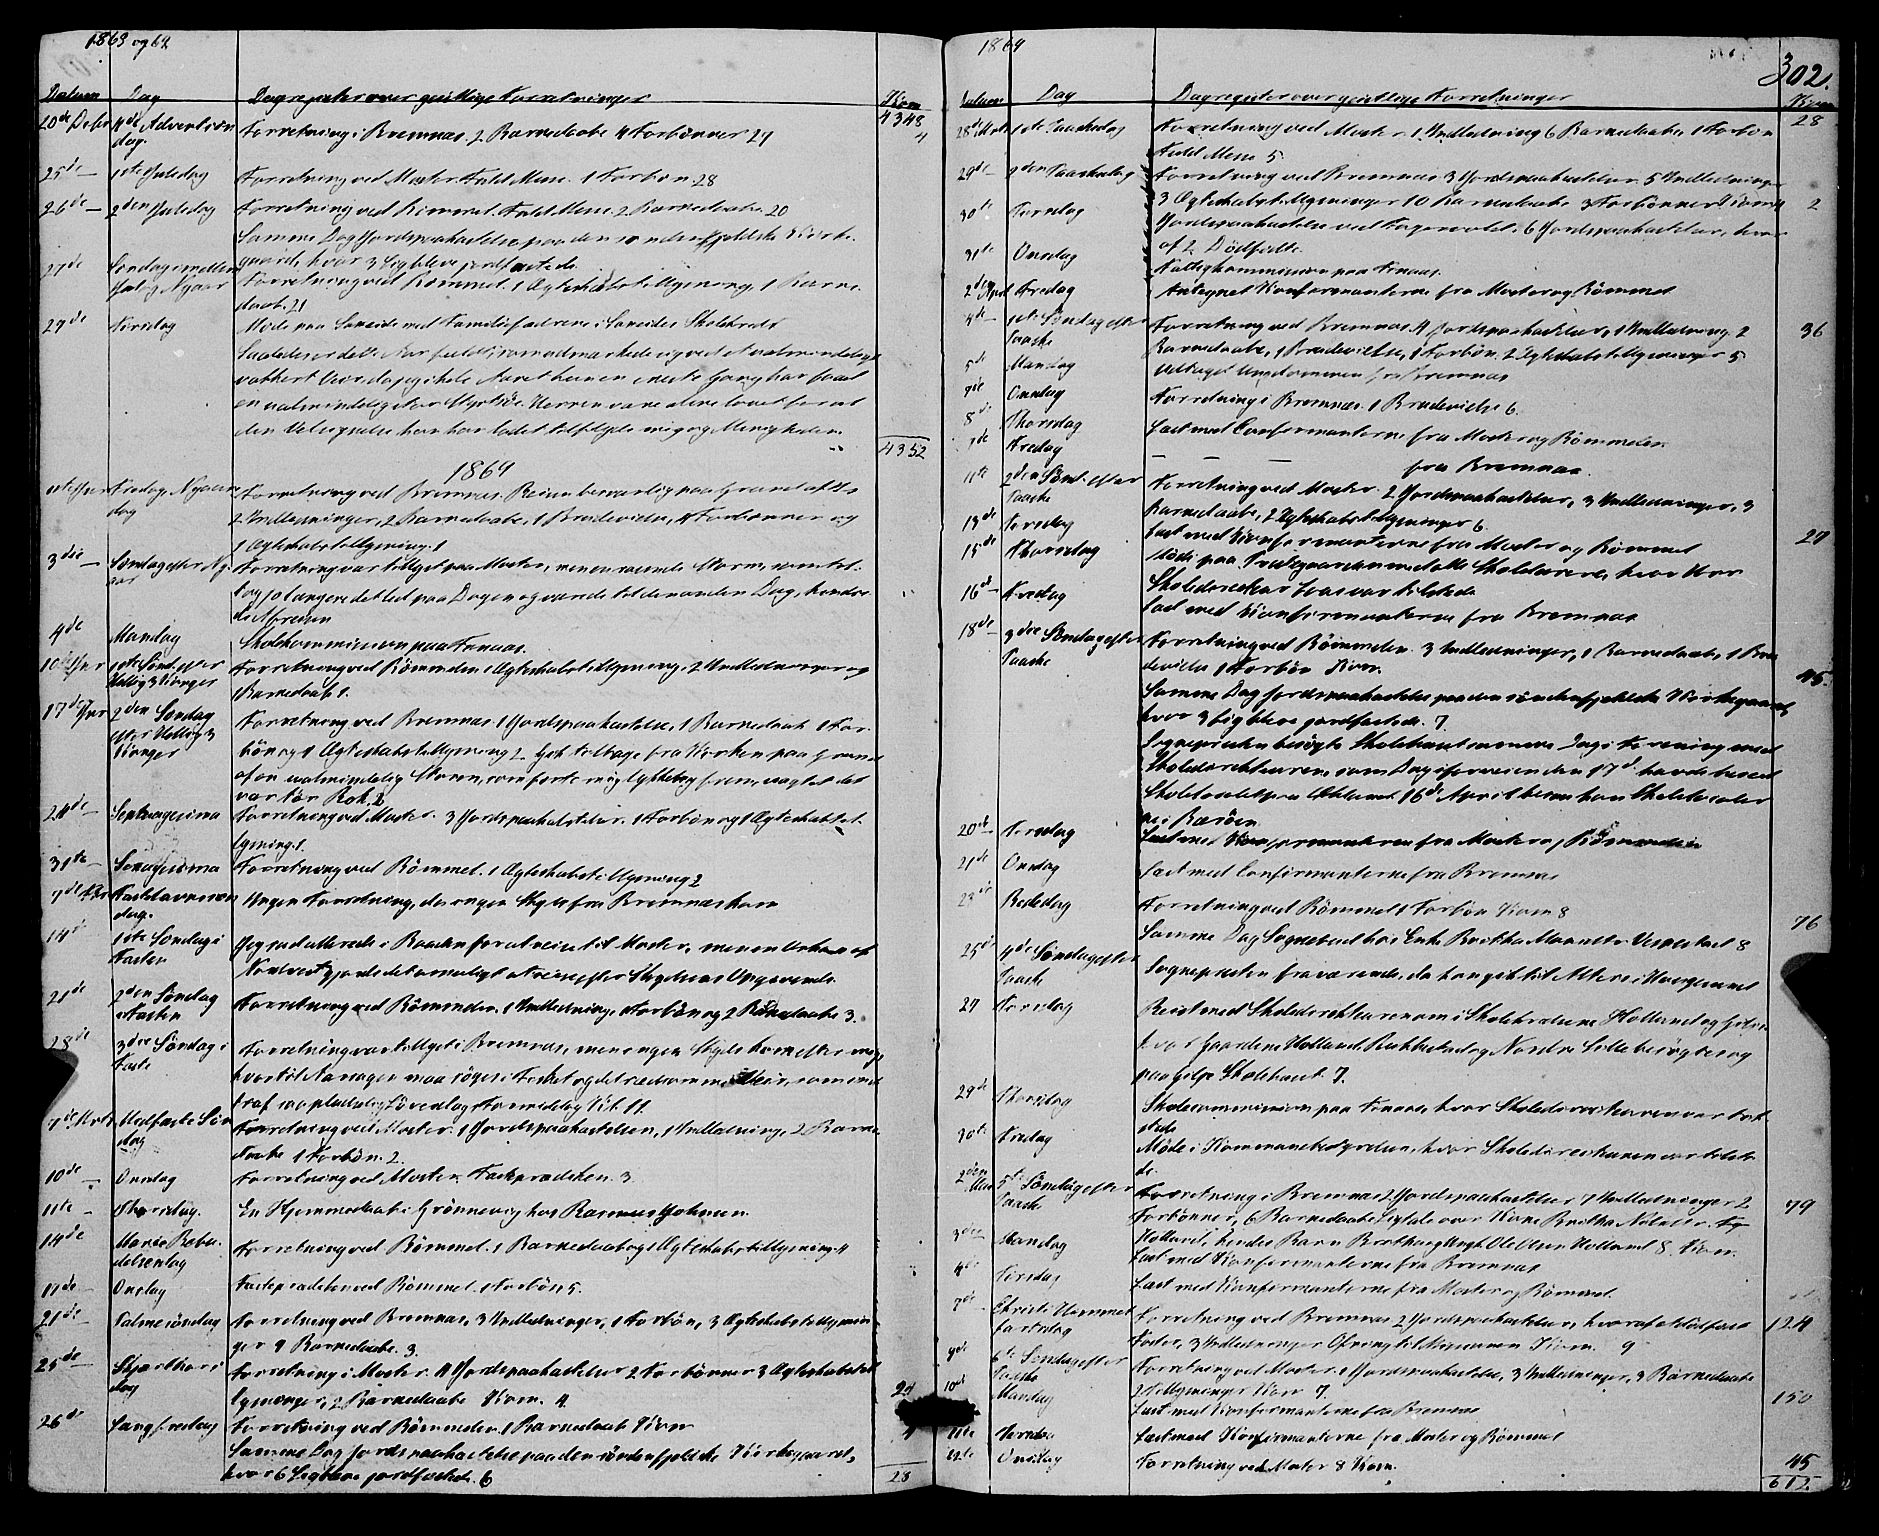 SAB, Finnås sokneprestembete, H/Ha/Haa/Haaa/L0008: Parish register (official) no. A 8, 1863-1872, p. 302